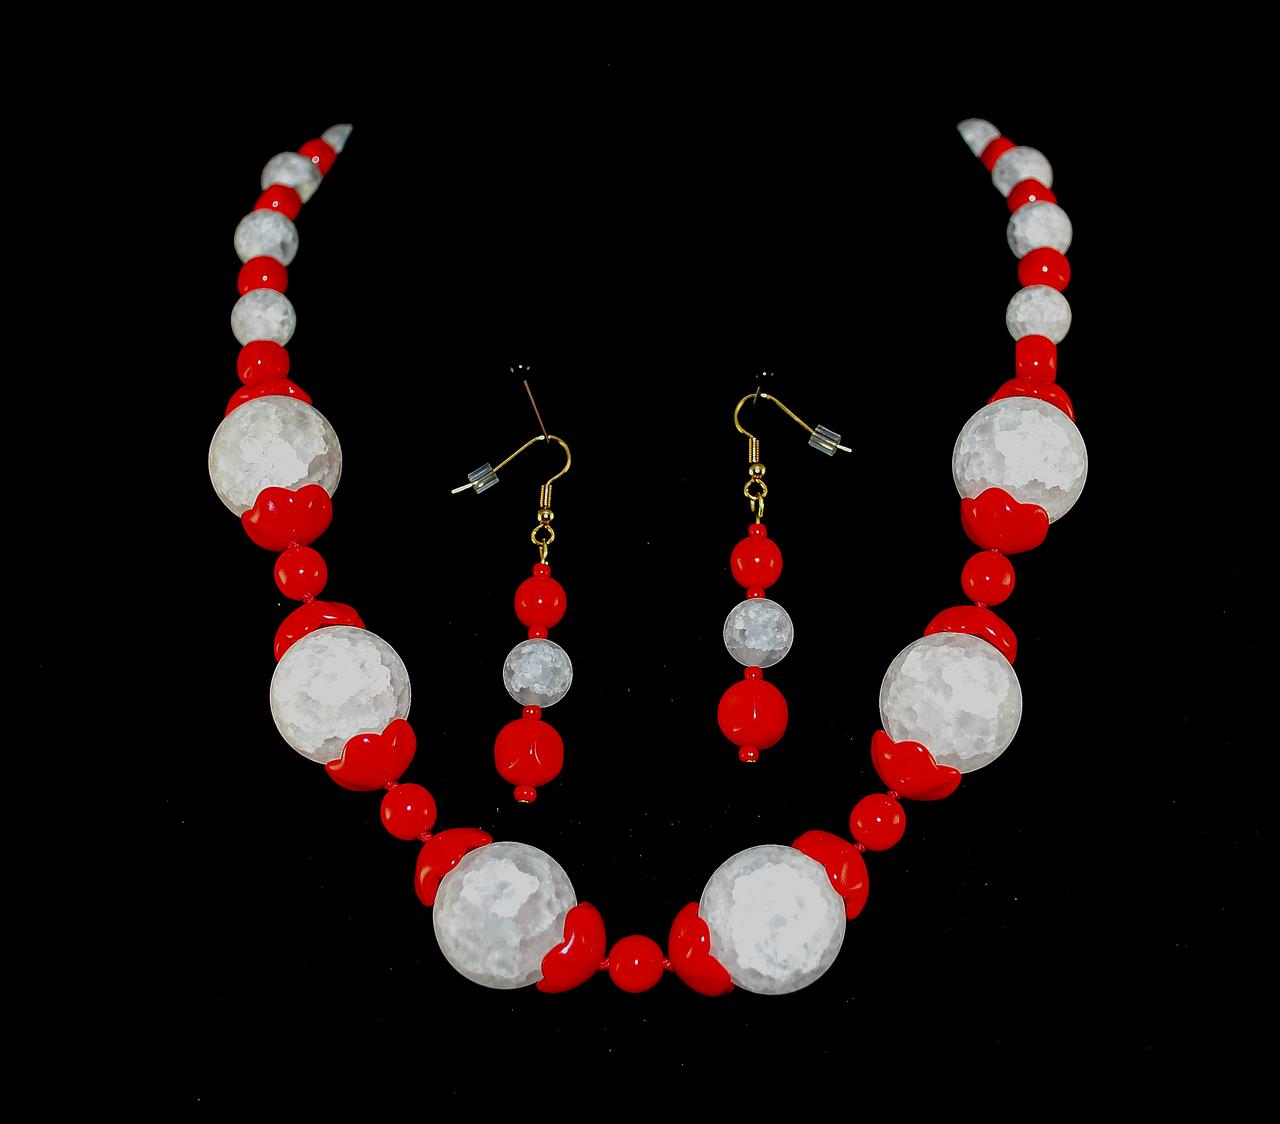 Enchanting Jewelry Creations image 62